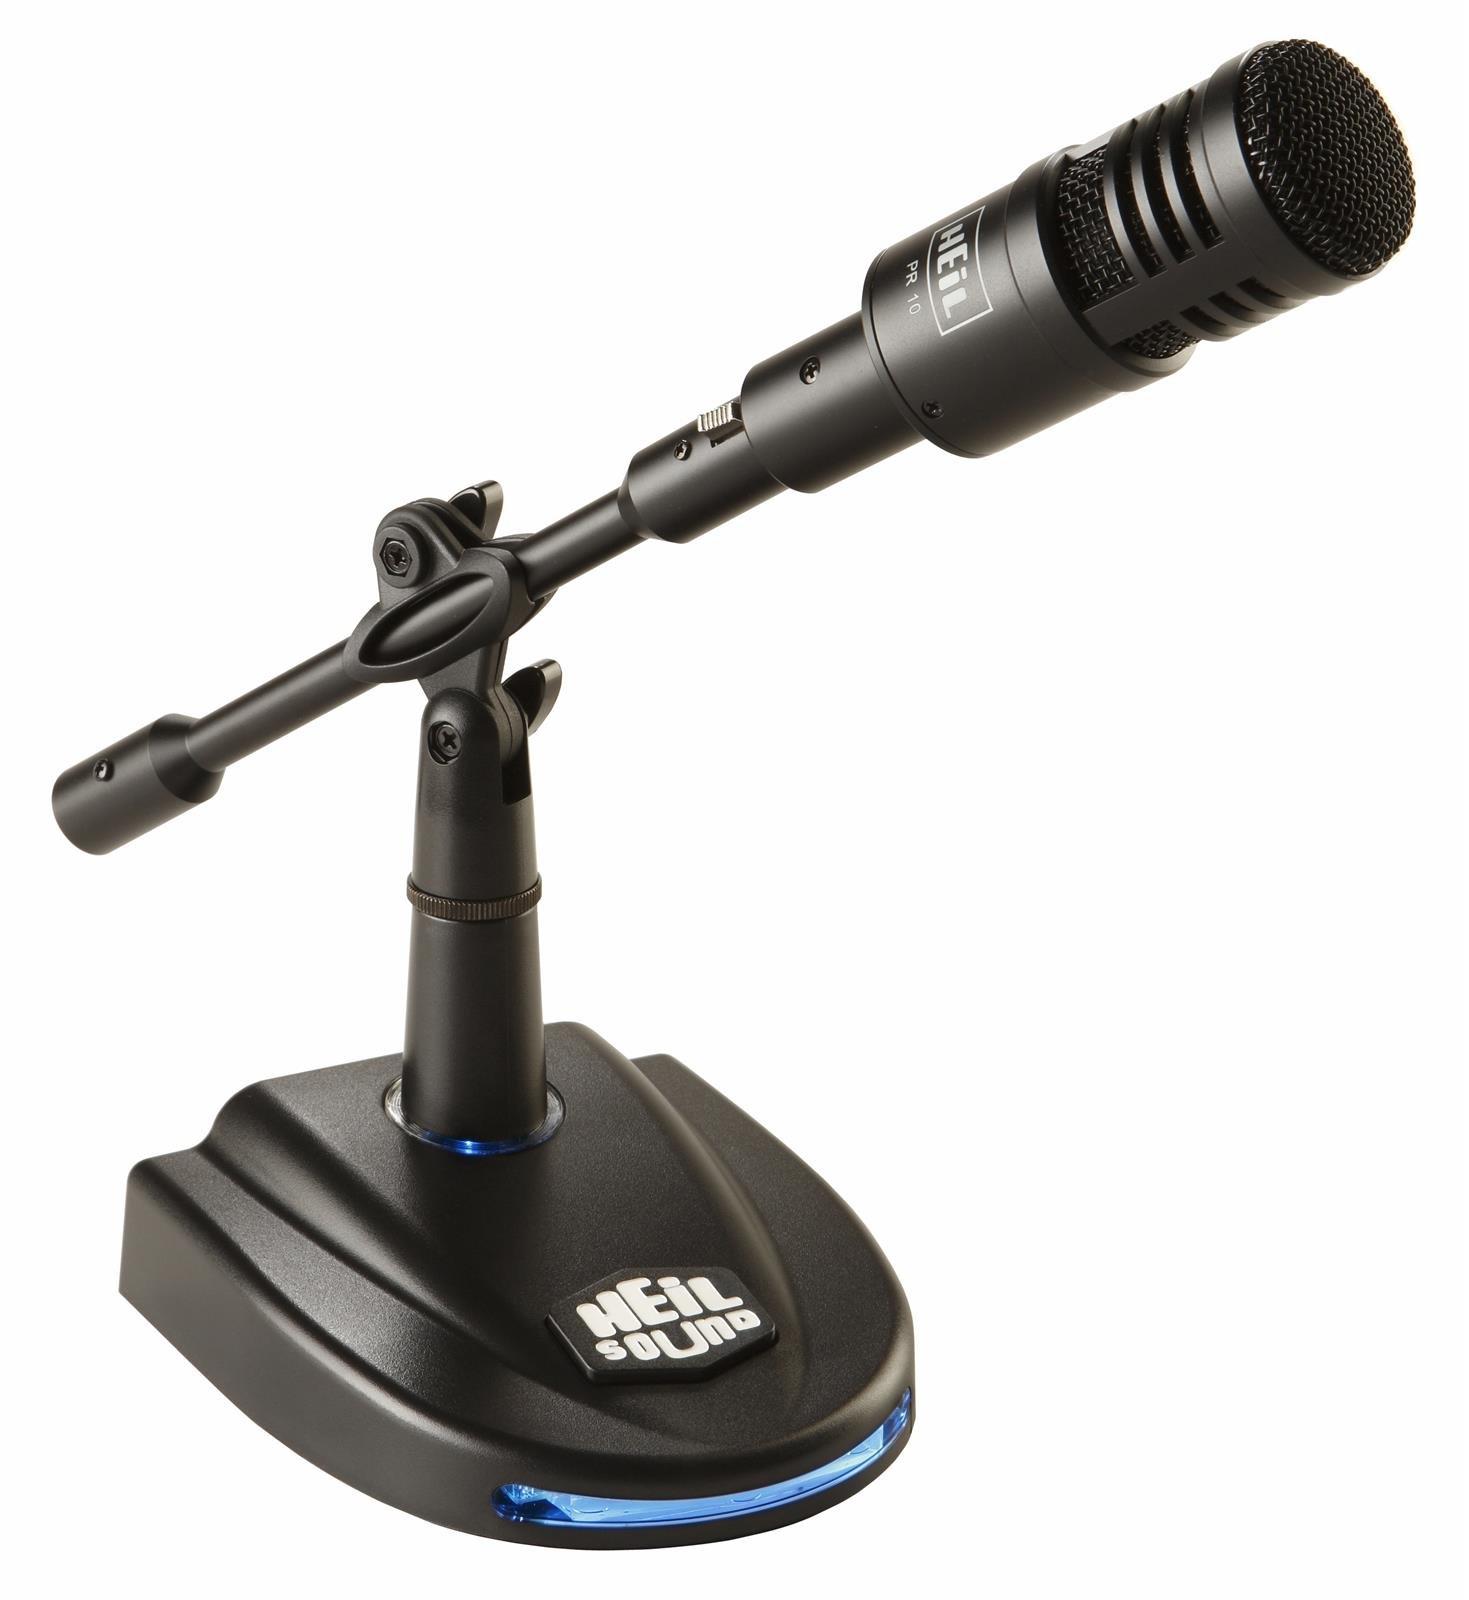 PR-10 PR10 Mic Package PR10PKG Original Heil Sound Dynamic Studio Microphone with LB-1 Lighted Base with PTT (3 Pin XLR)